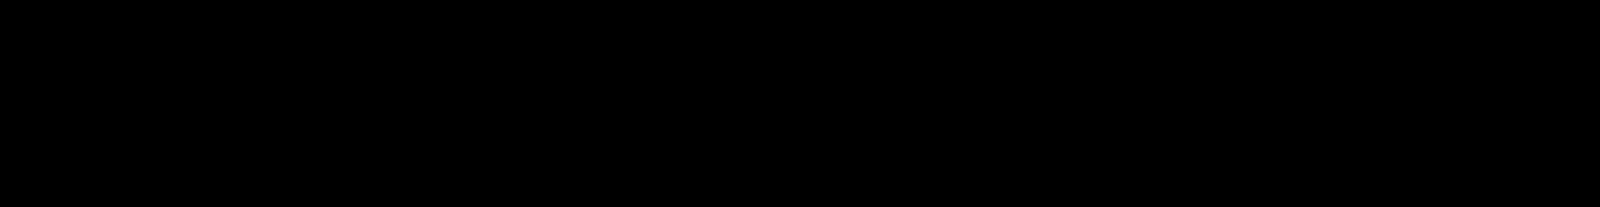 Odisea gráfica